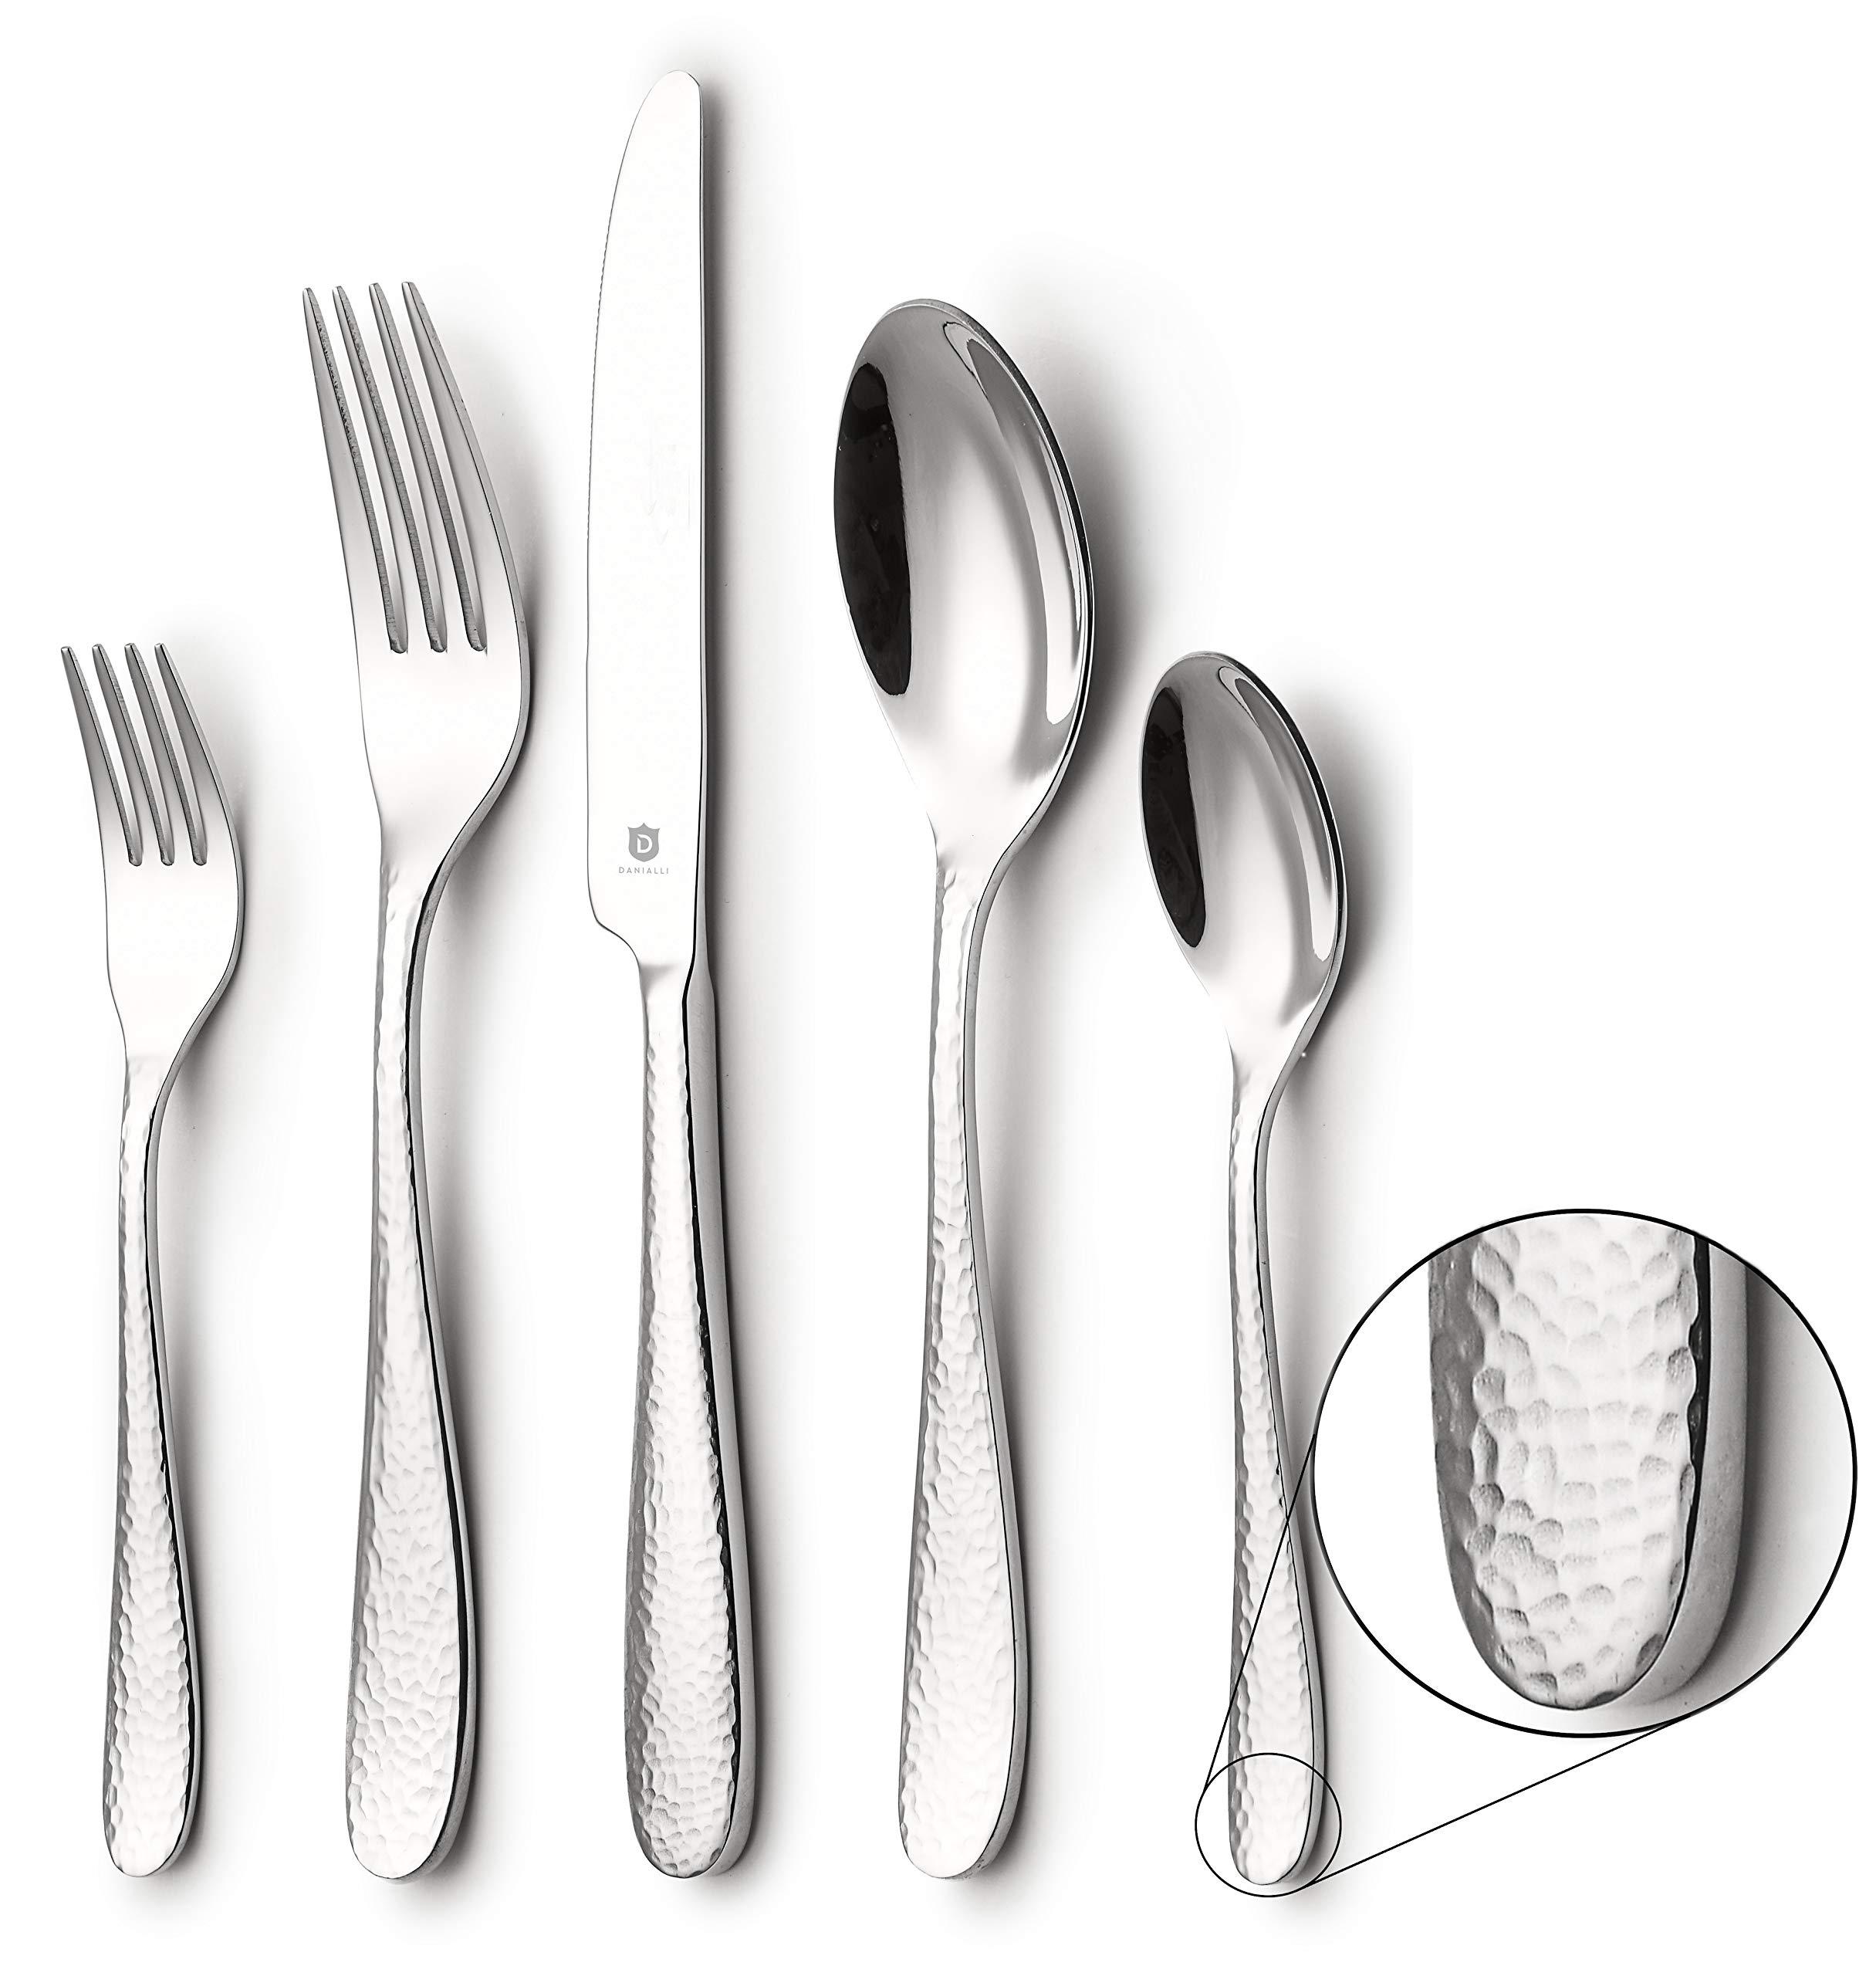 DANIALLI 30-Piece Flatware Set For 6, Modern Hammered Design Silverware Set, 18 10 Stainless Steel Utensils, Include Knife/Fork/Spoon, Mirror Polished Set of Cutlery, Dishwasher Safe